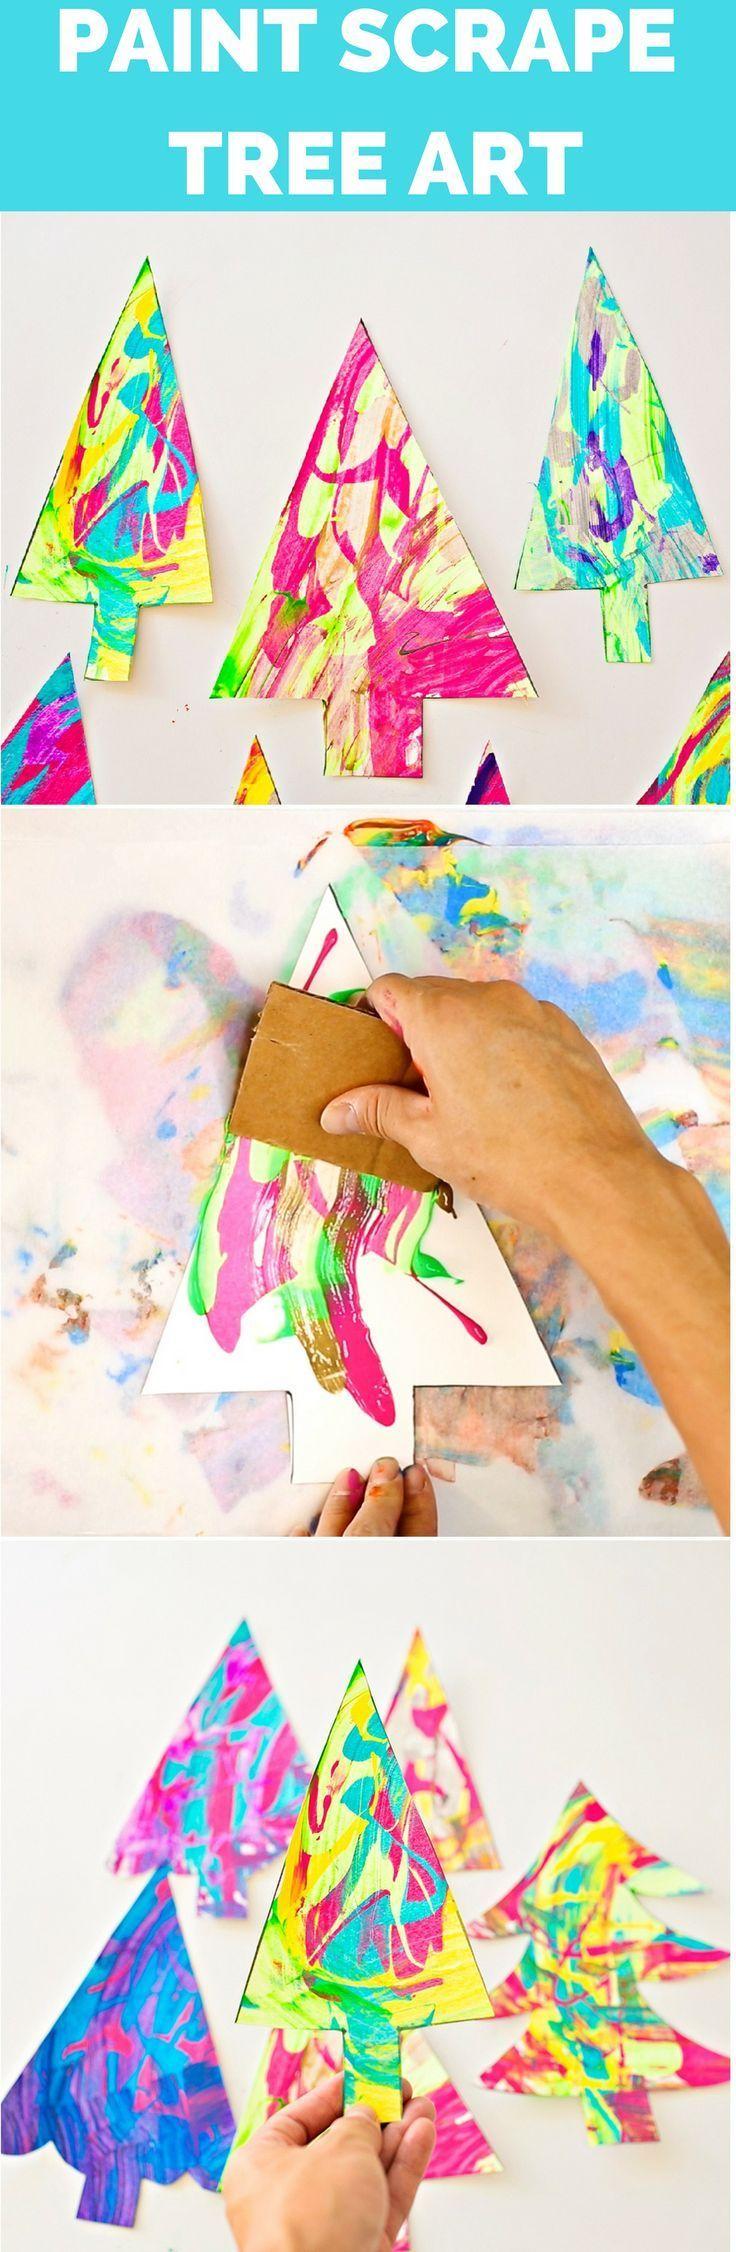 Paint Scrape Christmas Tree Art | Reggio Inspired Activities | Loose Parts Ideas | Hands On Learning Activities | Reggio Christmas | Christmas Art